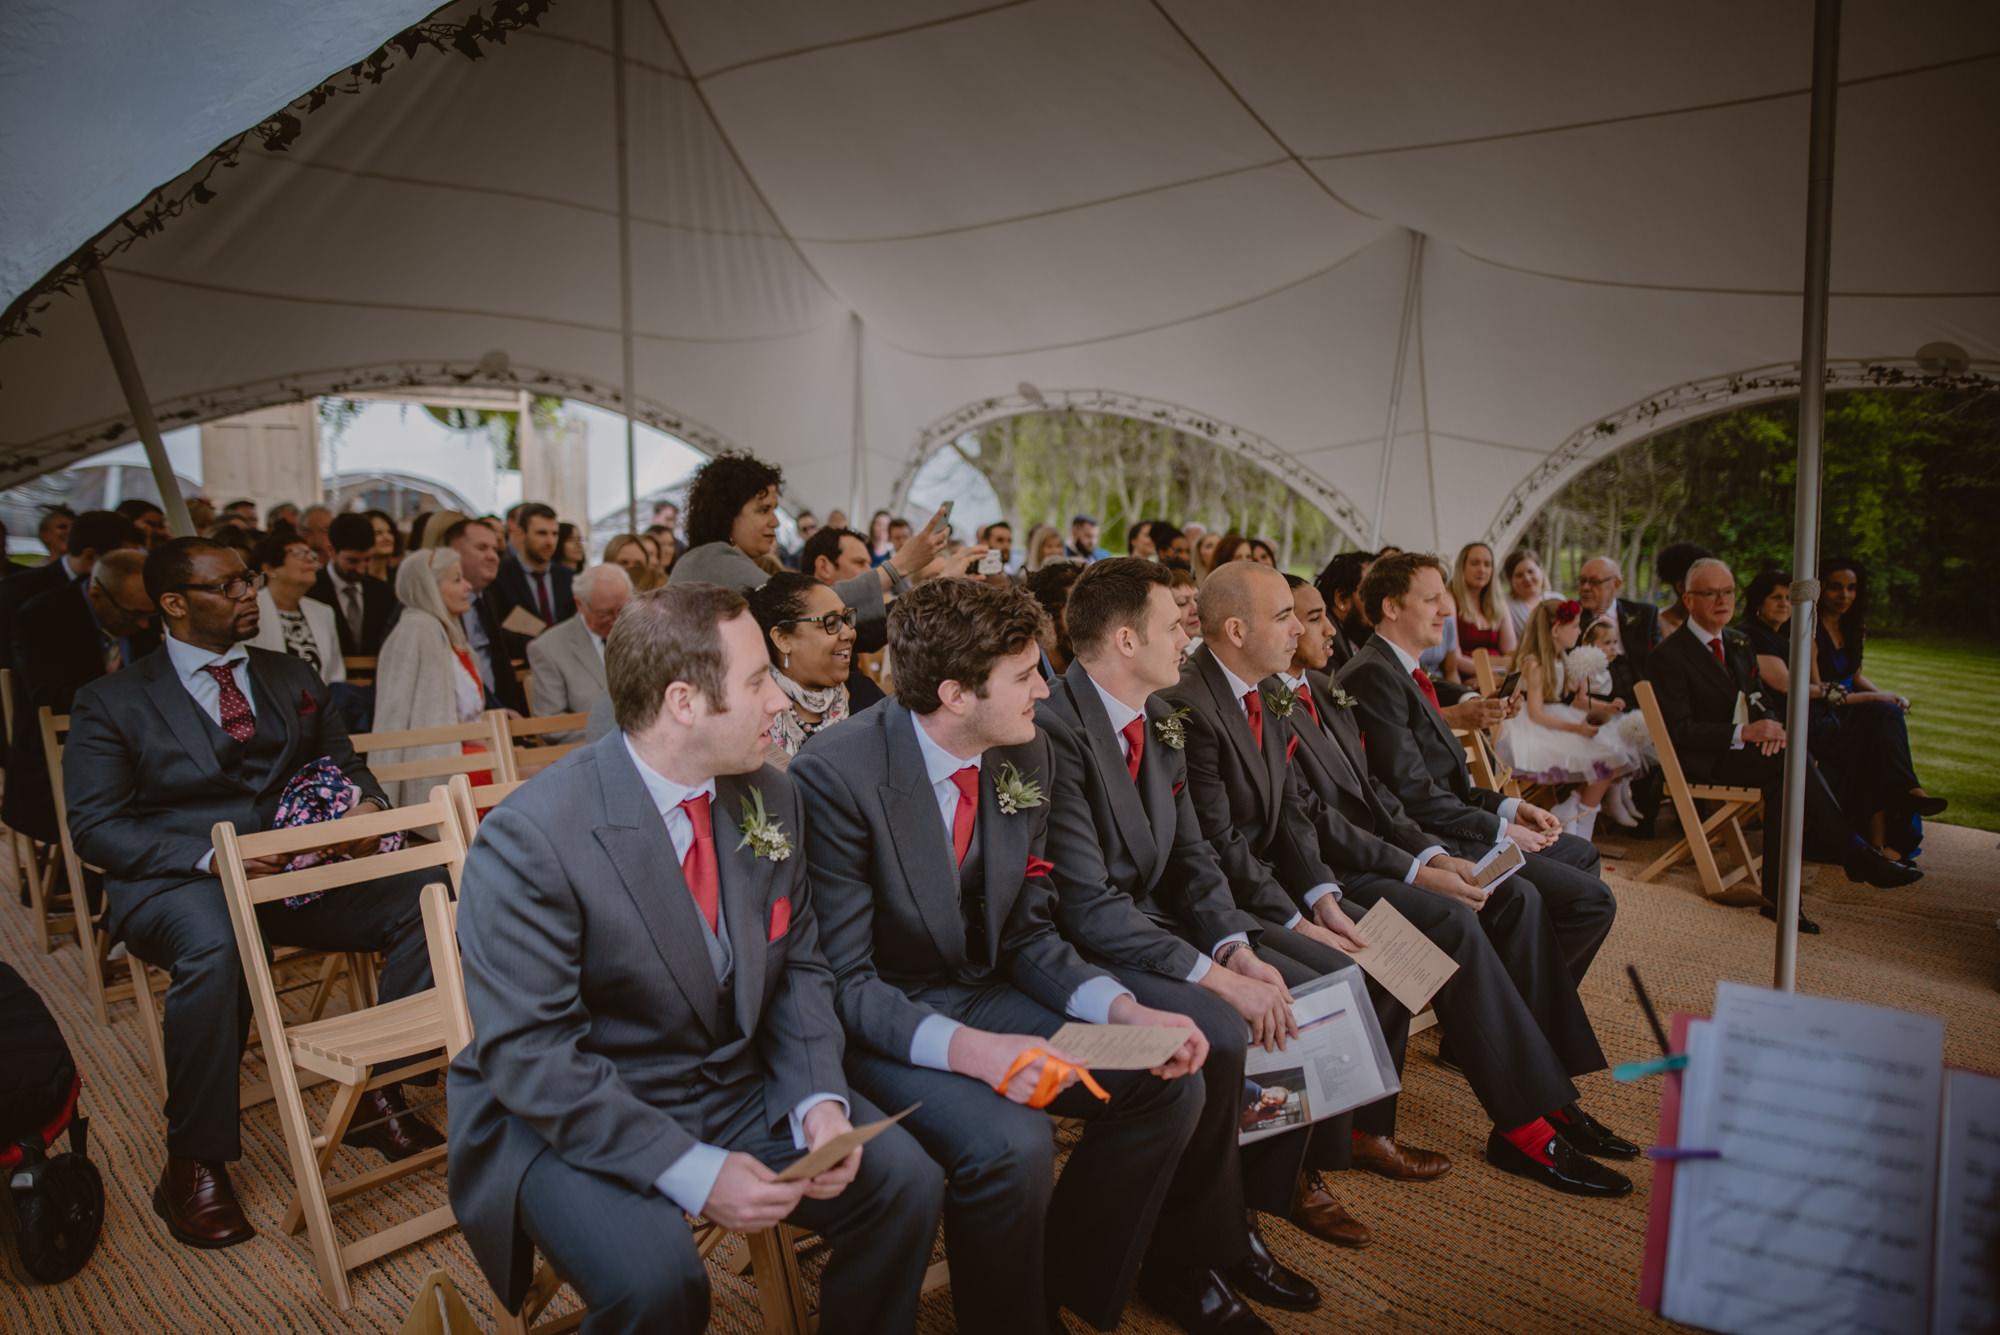 Jacqueline-Gareth-Wedding-Westmead-Events-Surrey-Manu-Mendoza-Wedding-Photography-222.jpg